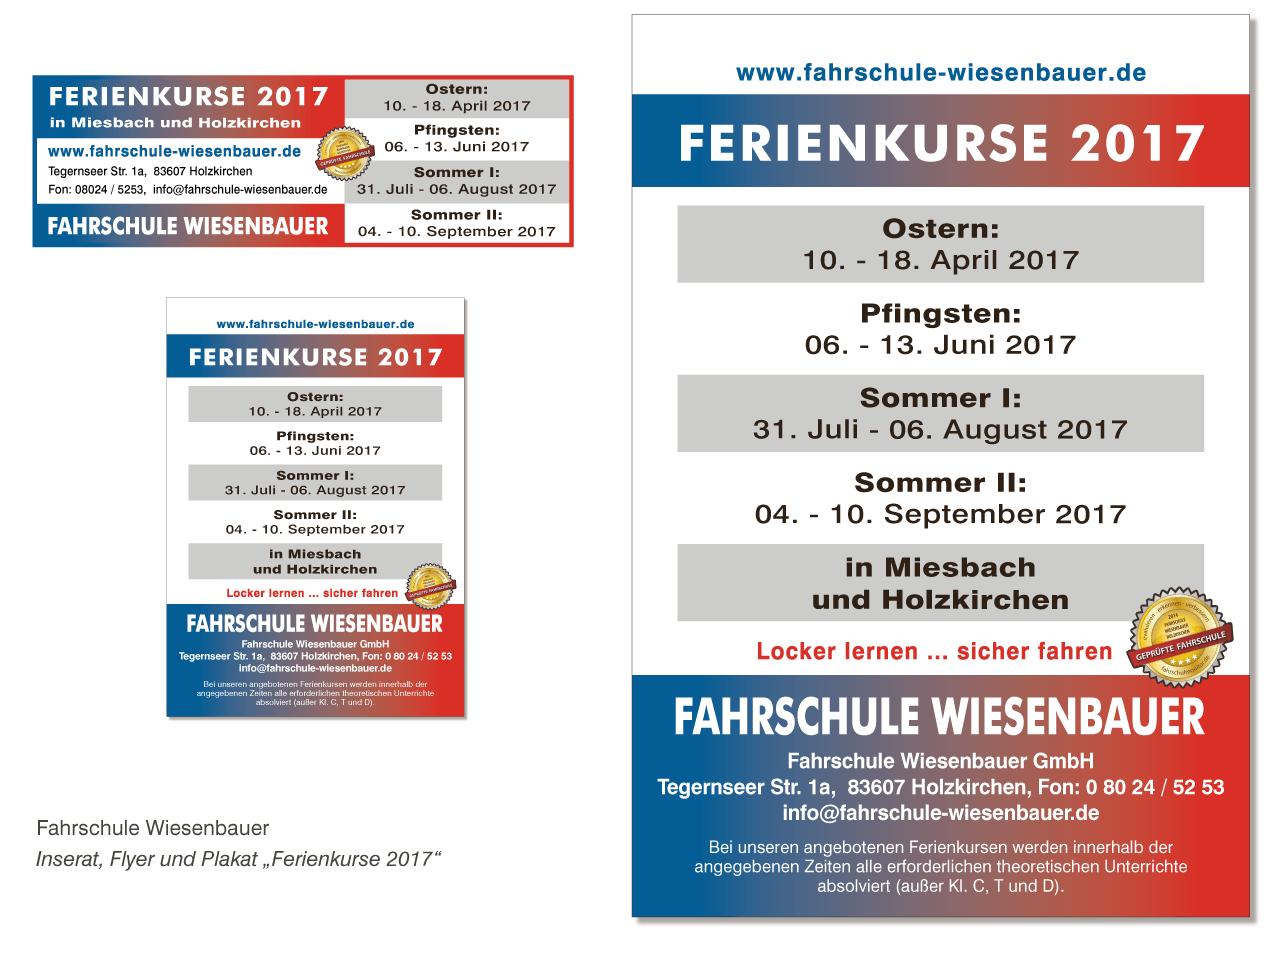 "Fahrschule Wiesenbauer - Inserat, Flyer und Plakat ""Ferienkurse 2017"""